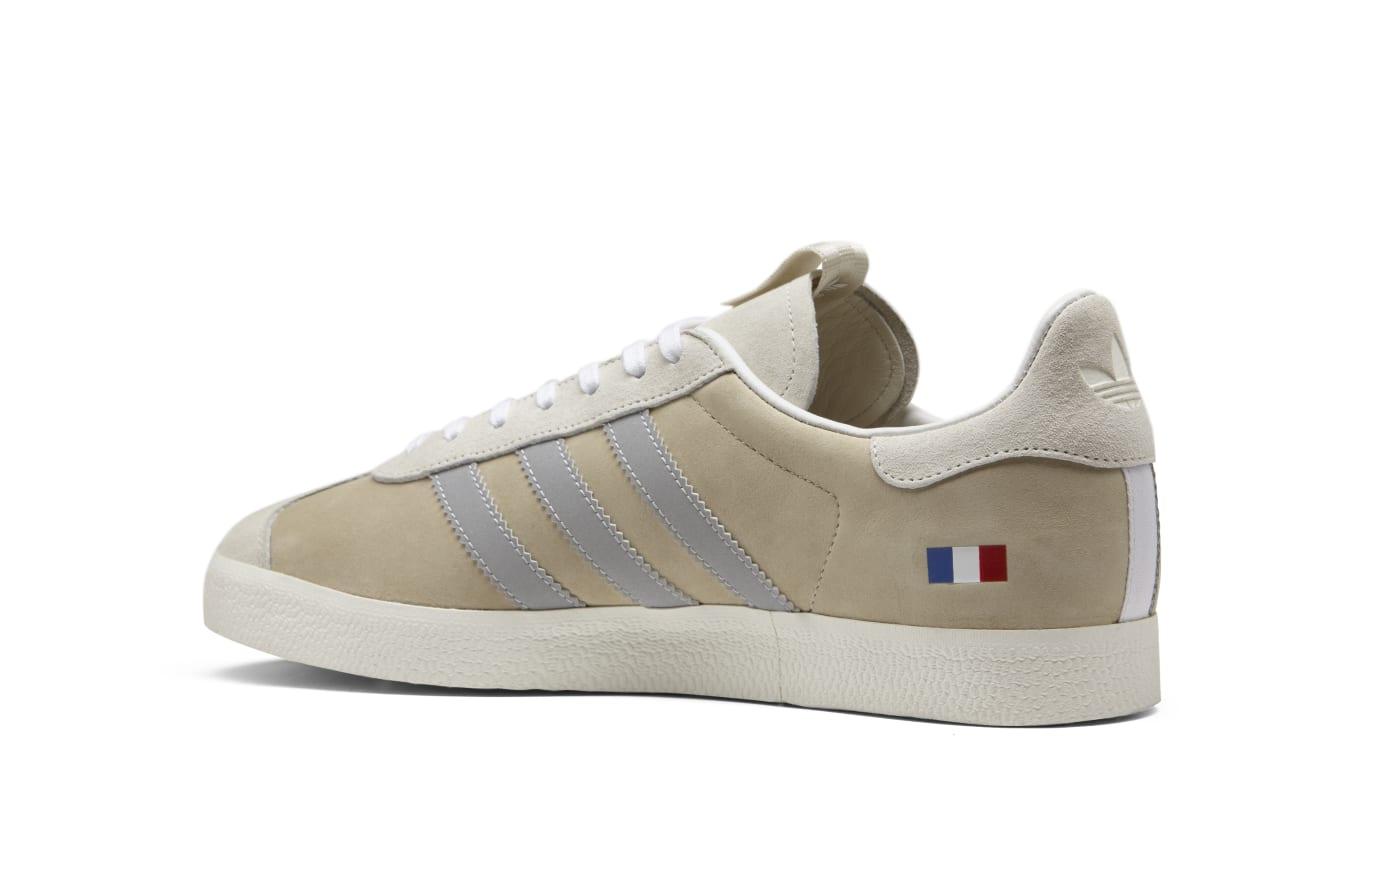 e1d69e85bea670 Image via Adidas Alife x Starcow Adidas Consortium Exchange Gazelle  (Lateral Heel)